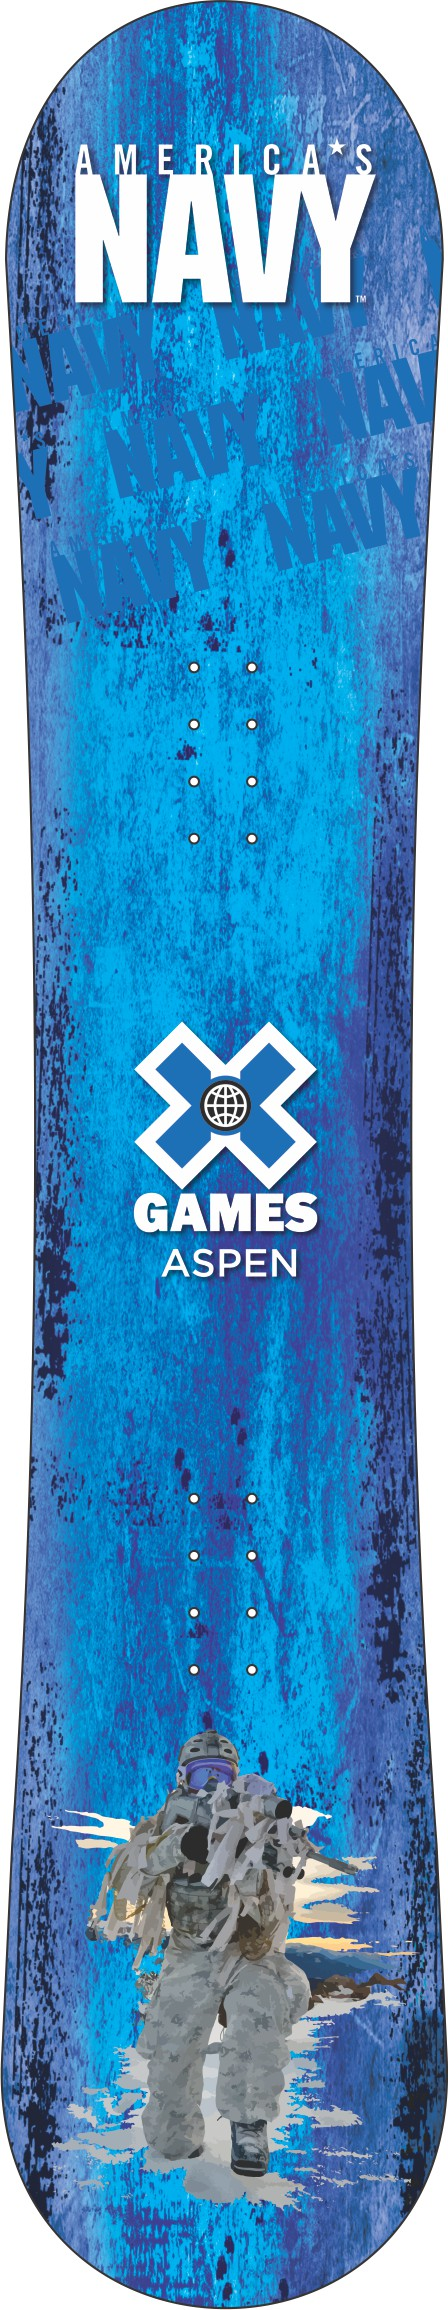 X Games - Navy 2107 - Snowboard.jpg